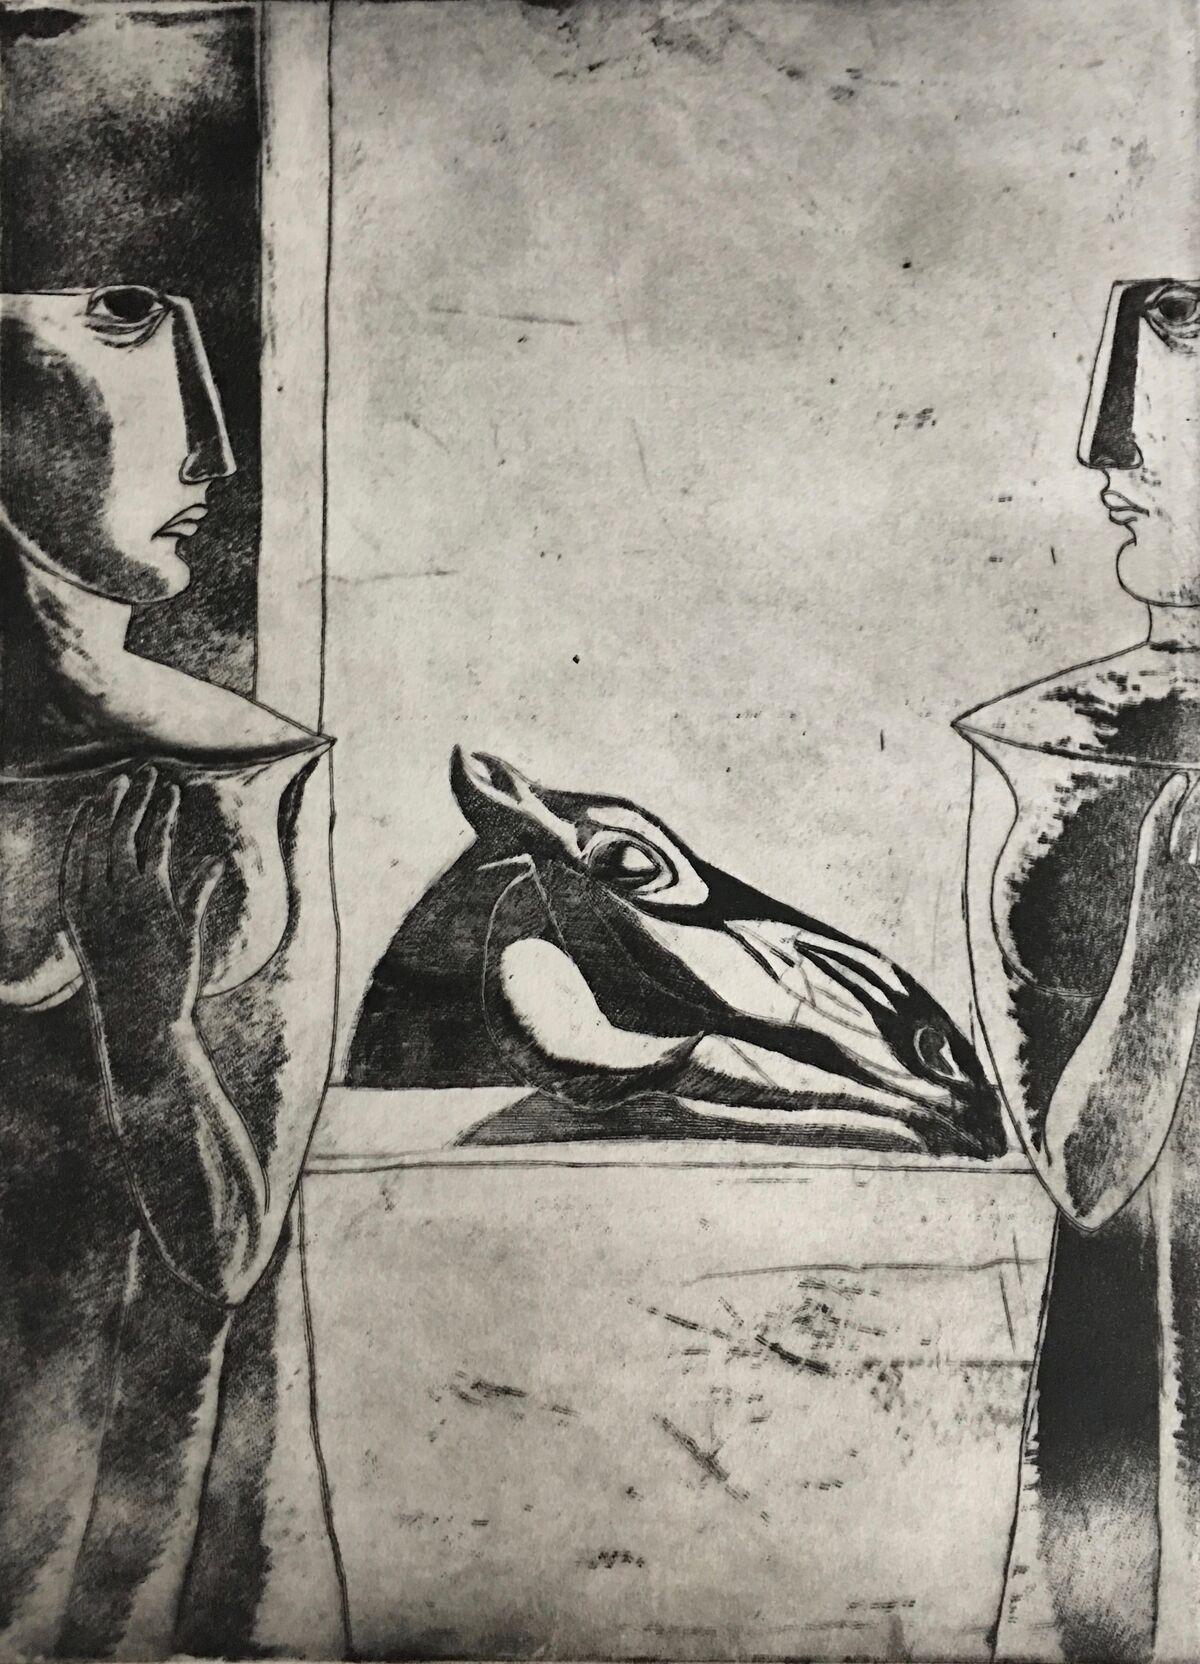 Ahmed Morsi, The Loving Horse, 1996. Courtesy of Gypsum Gallery.